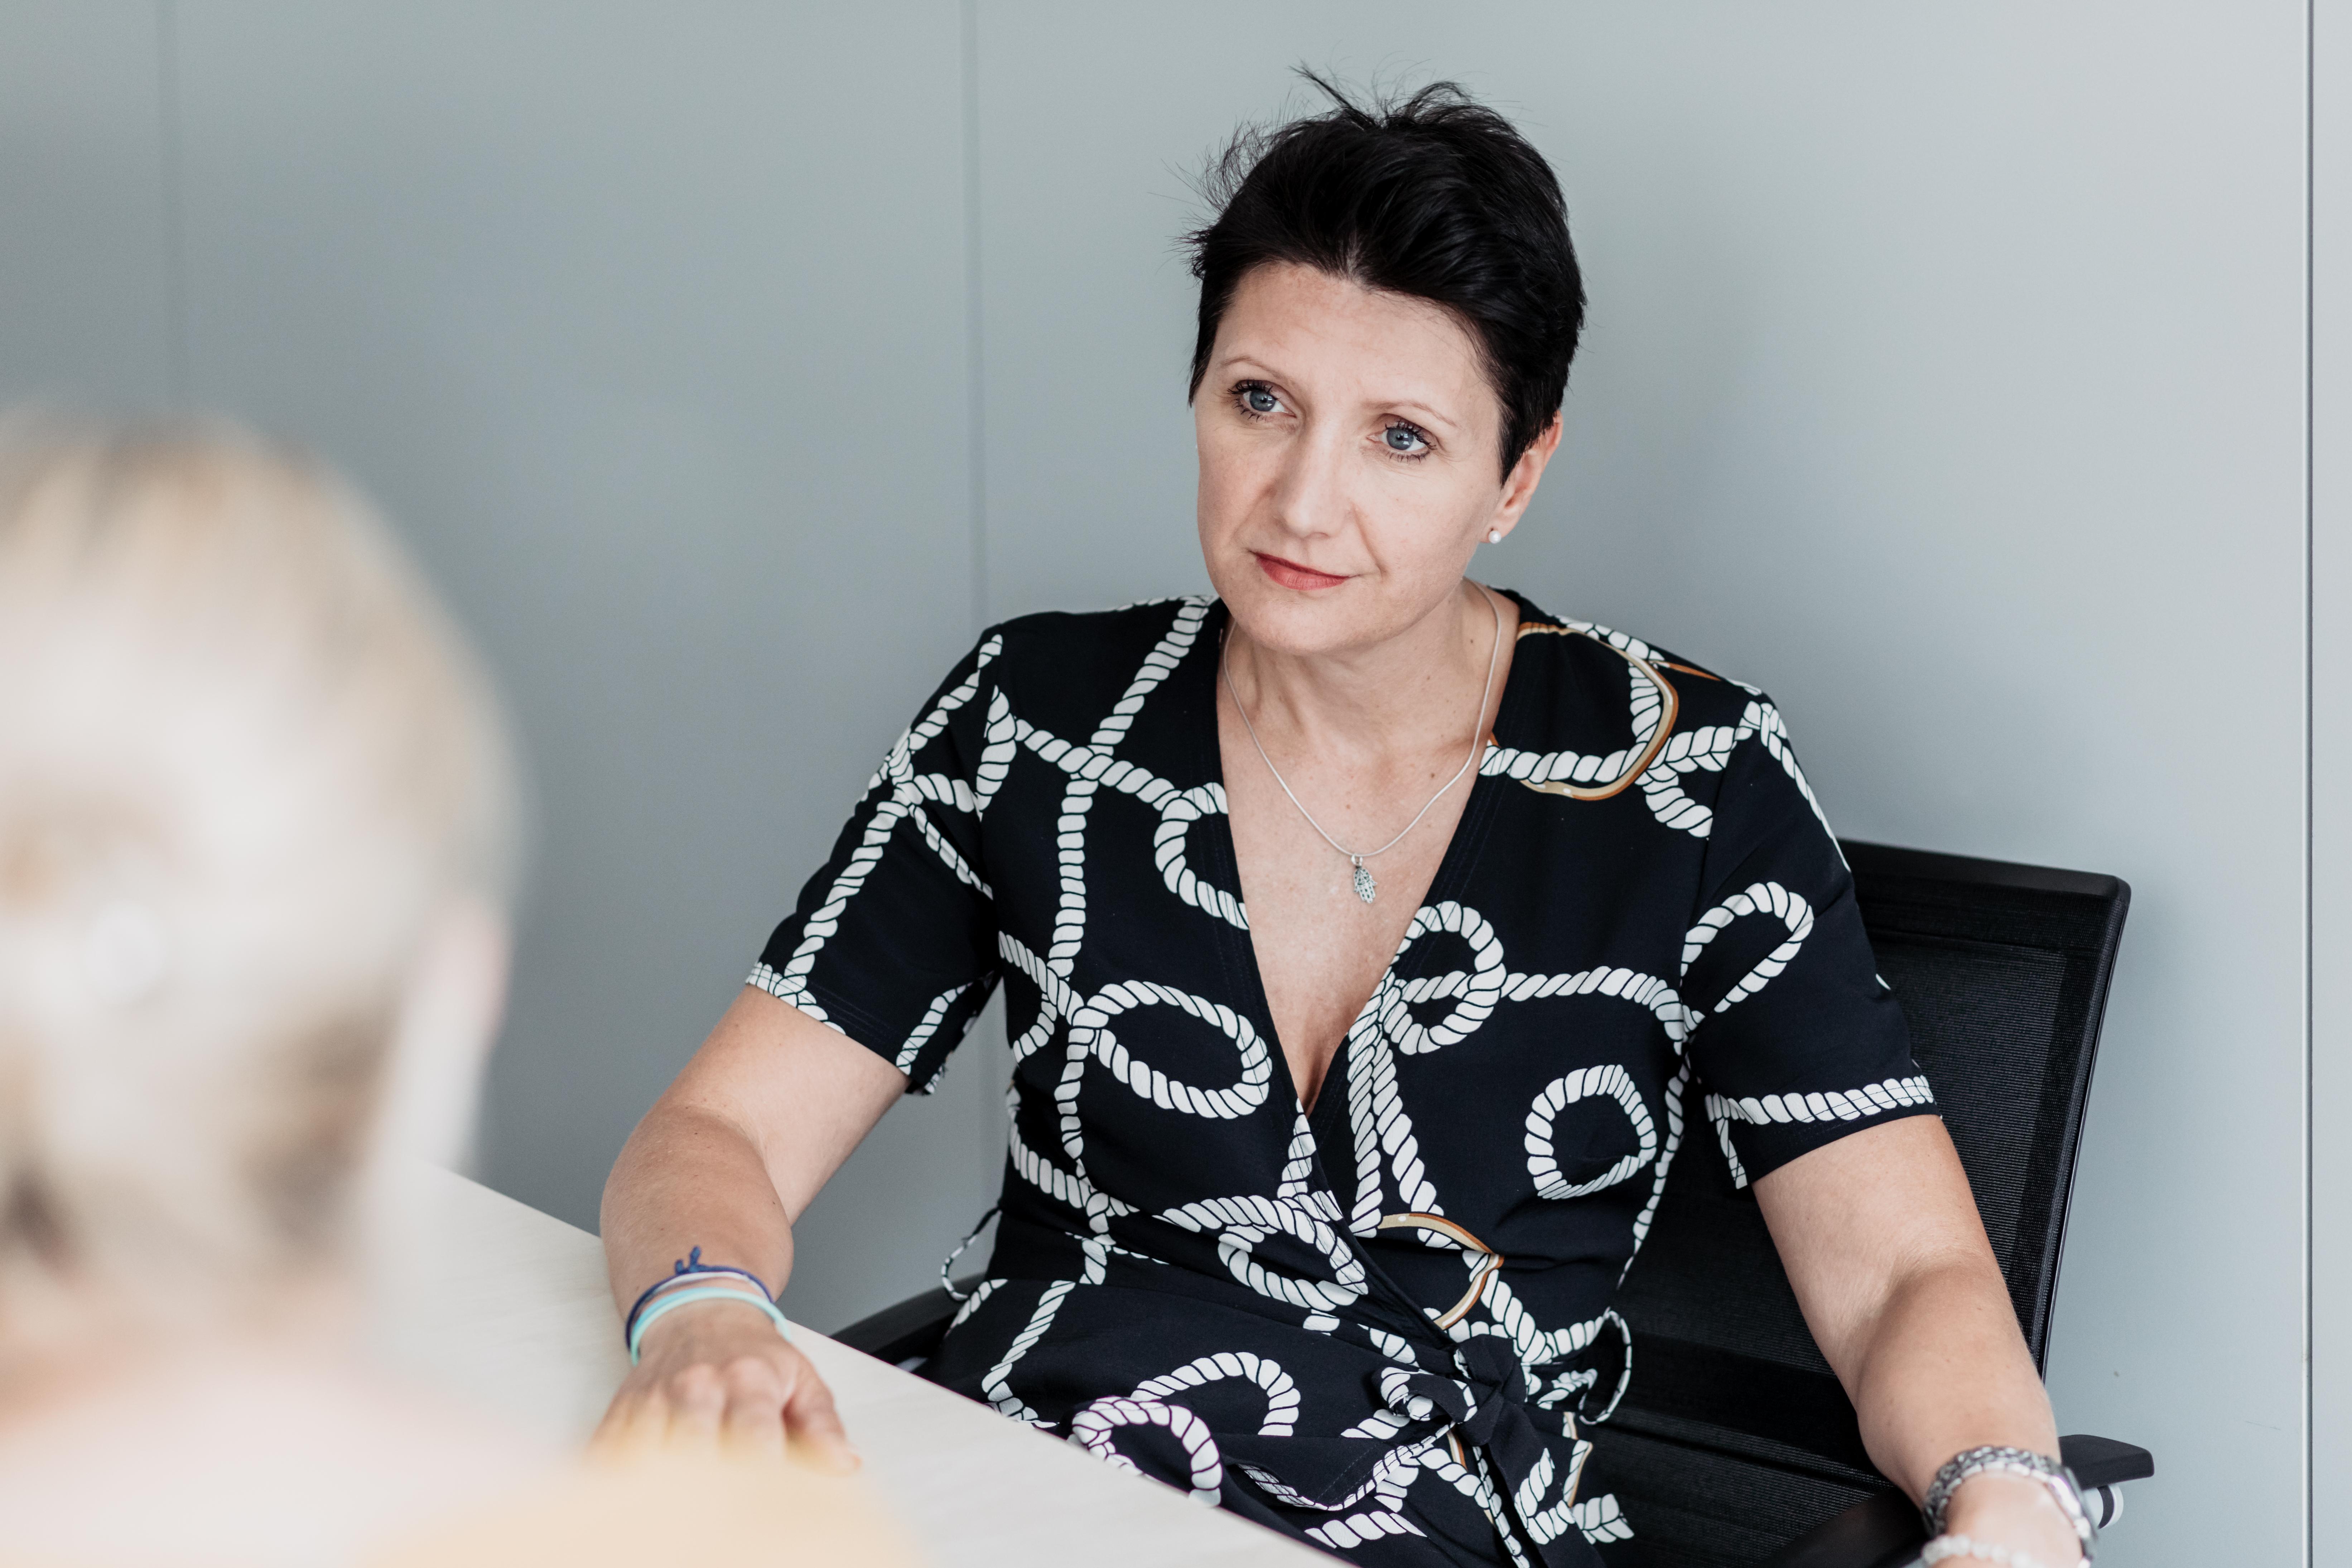 Sandra Bauernfeind Ehl a3bau bautage